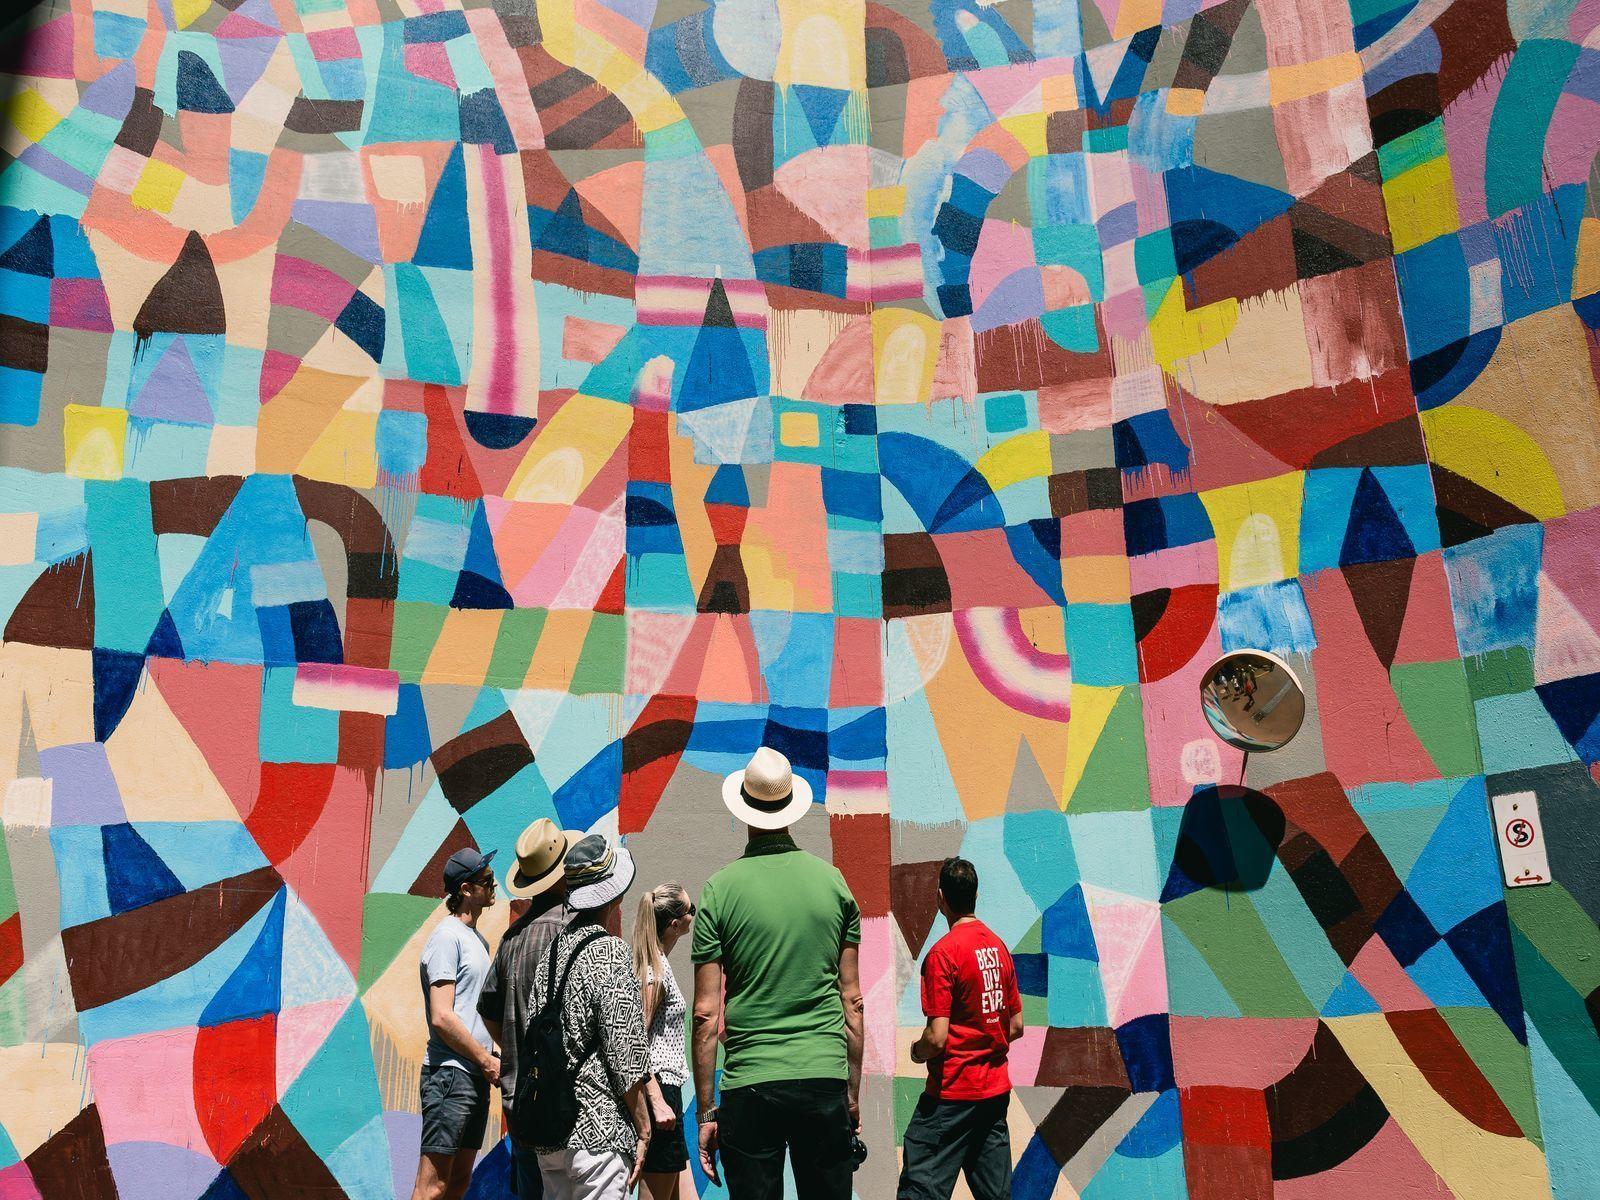 Small-Group Perth: Arcades & Laneways Walking Tour